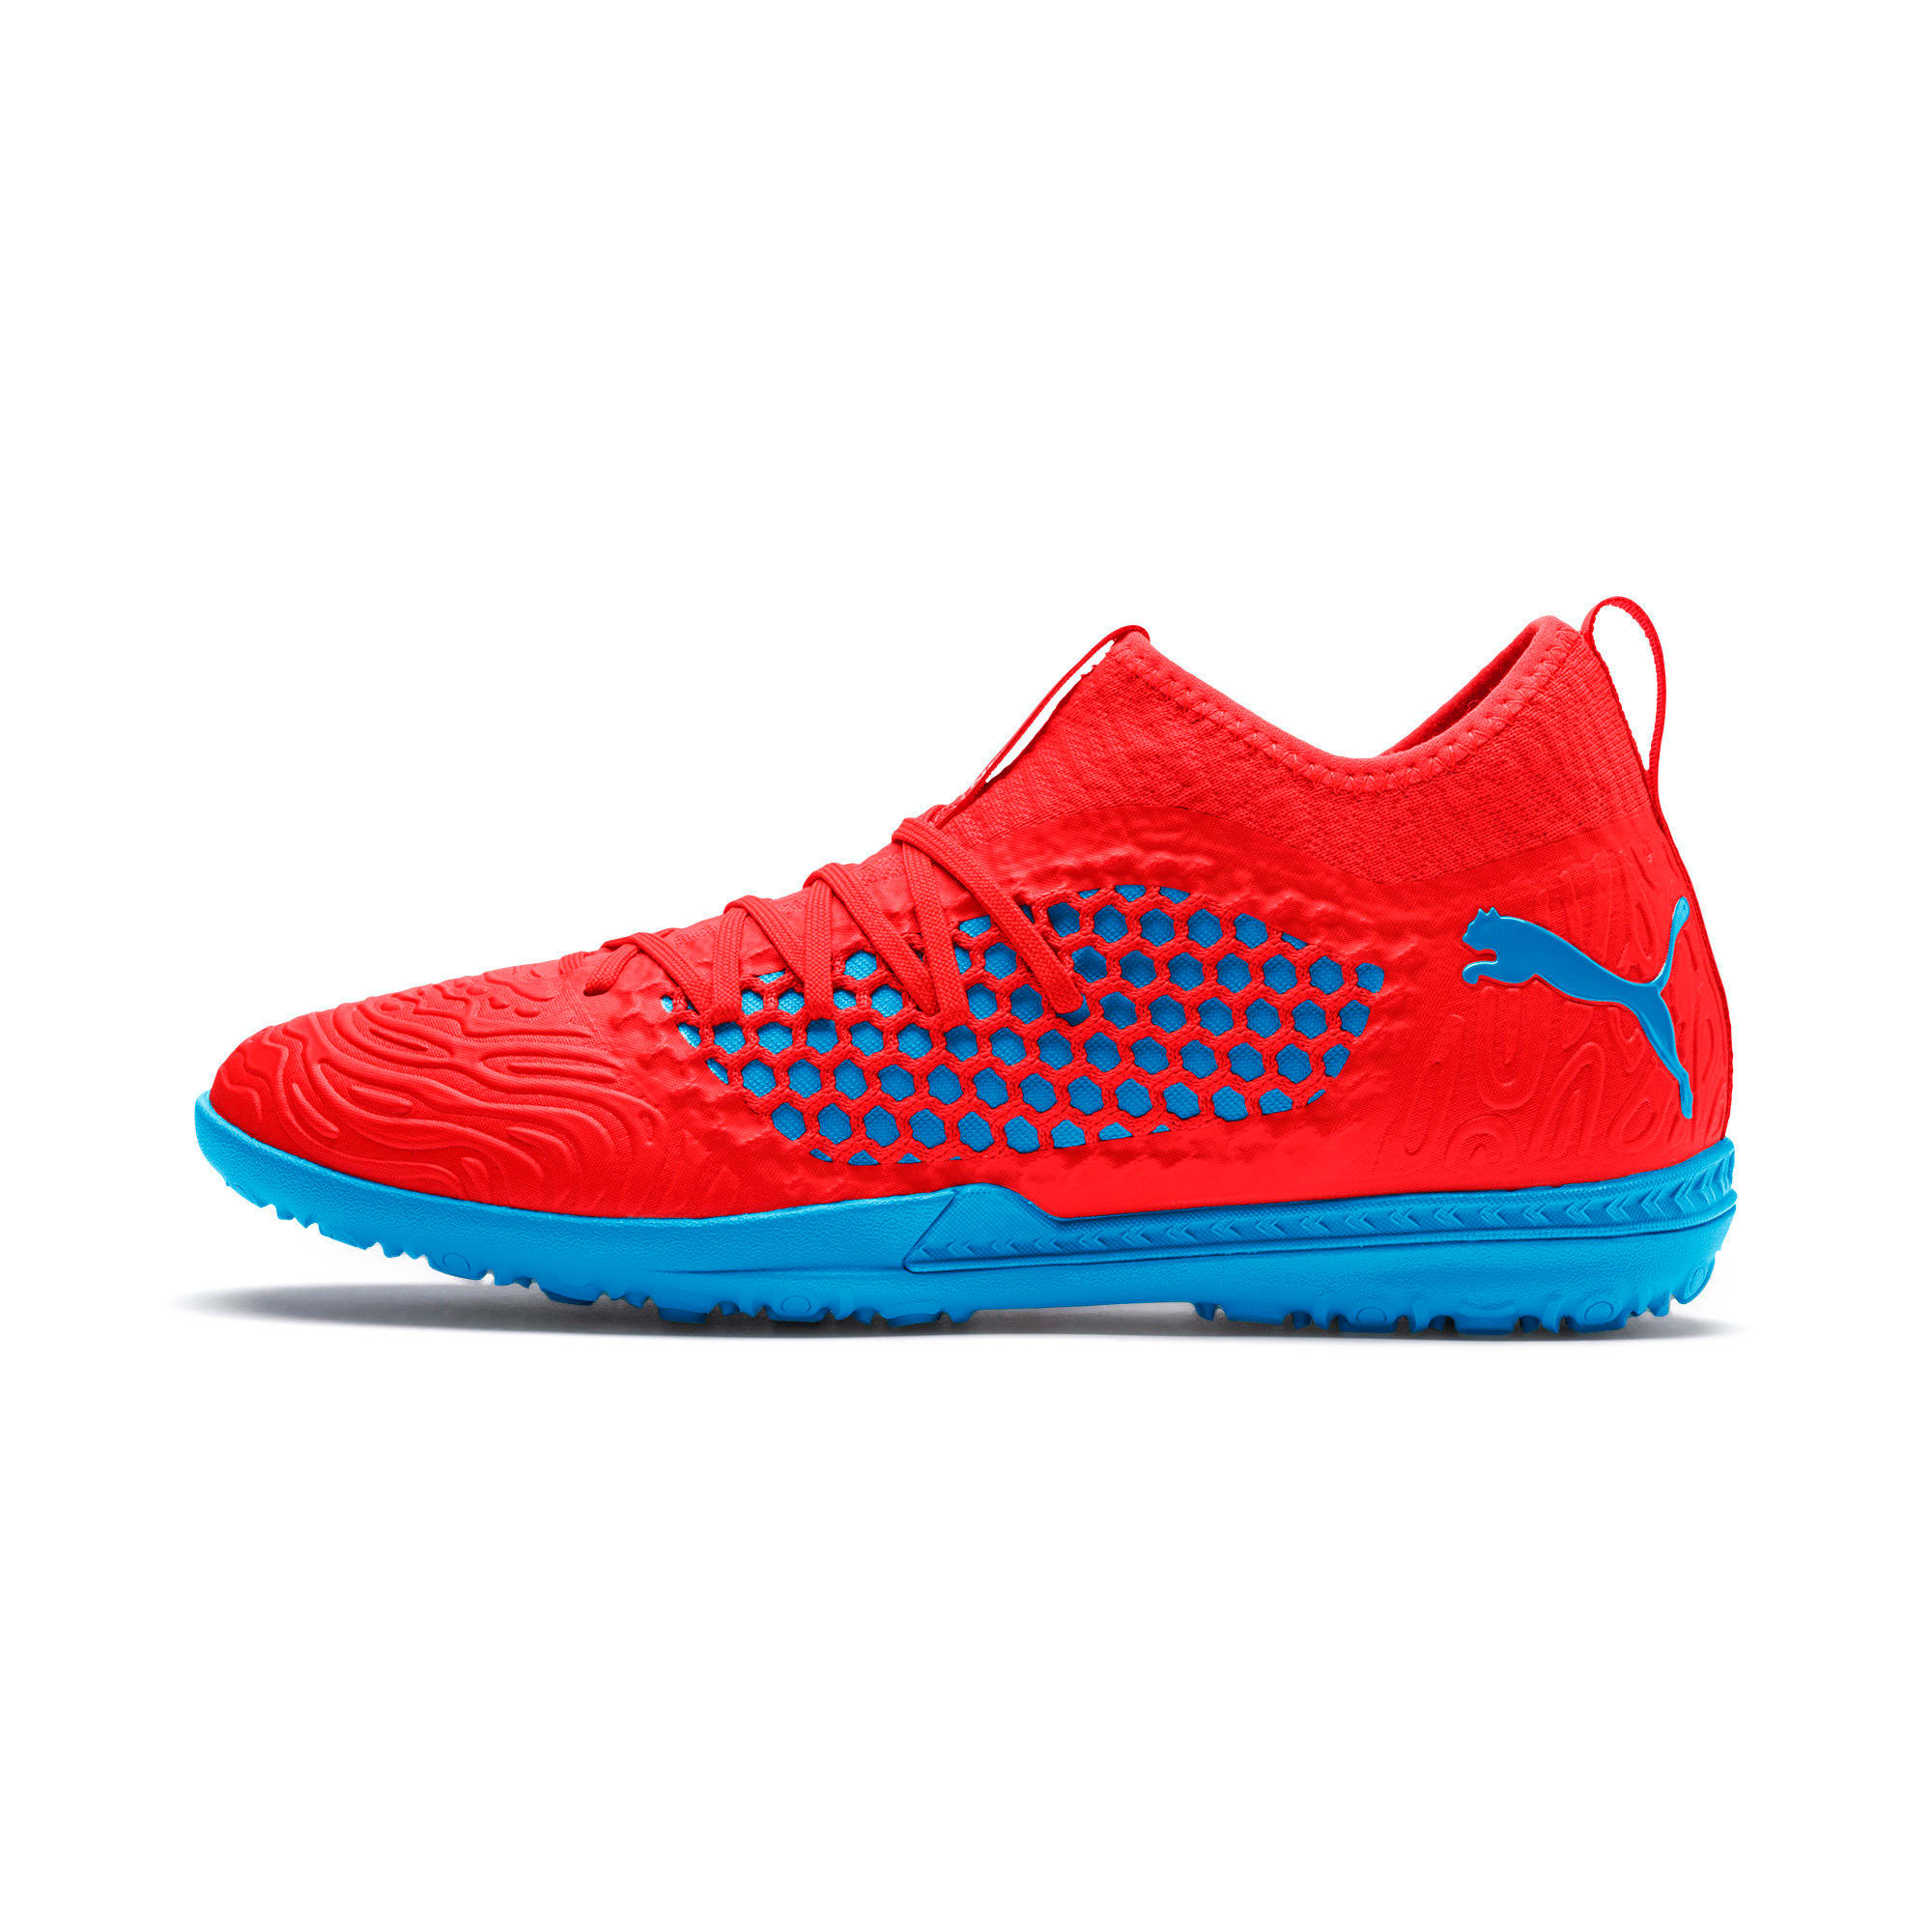 Thumbnail 1 of FUTURE 19.3 NETFIT TT Men's Soccer Shoes, Red Blast-Bleu Azur, medium